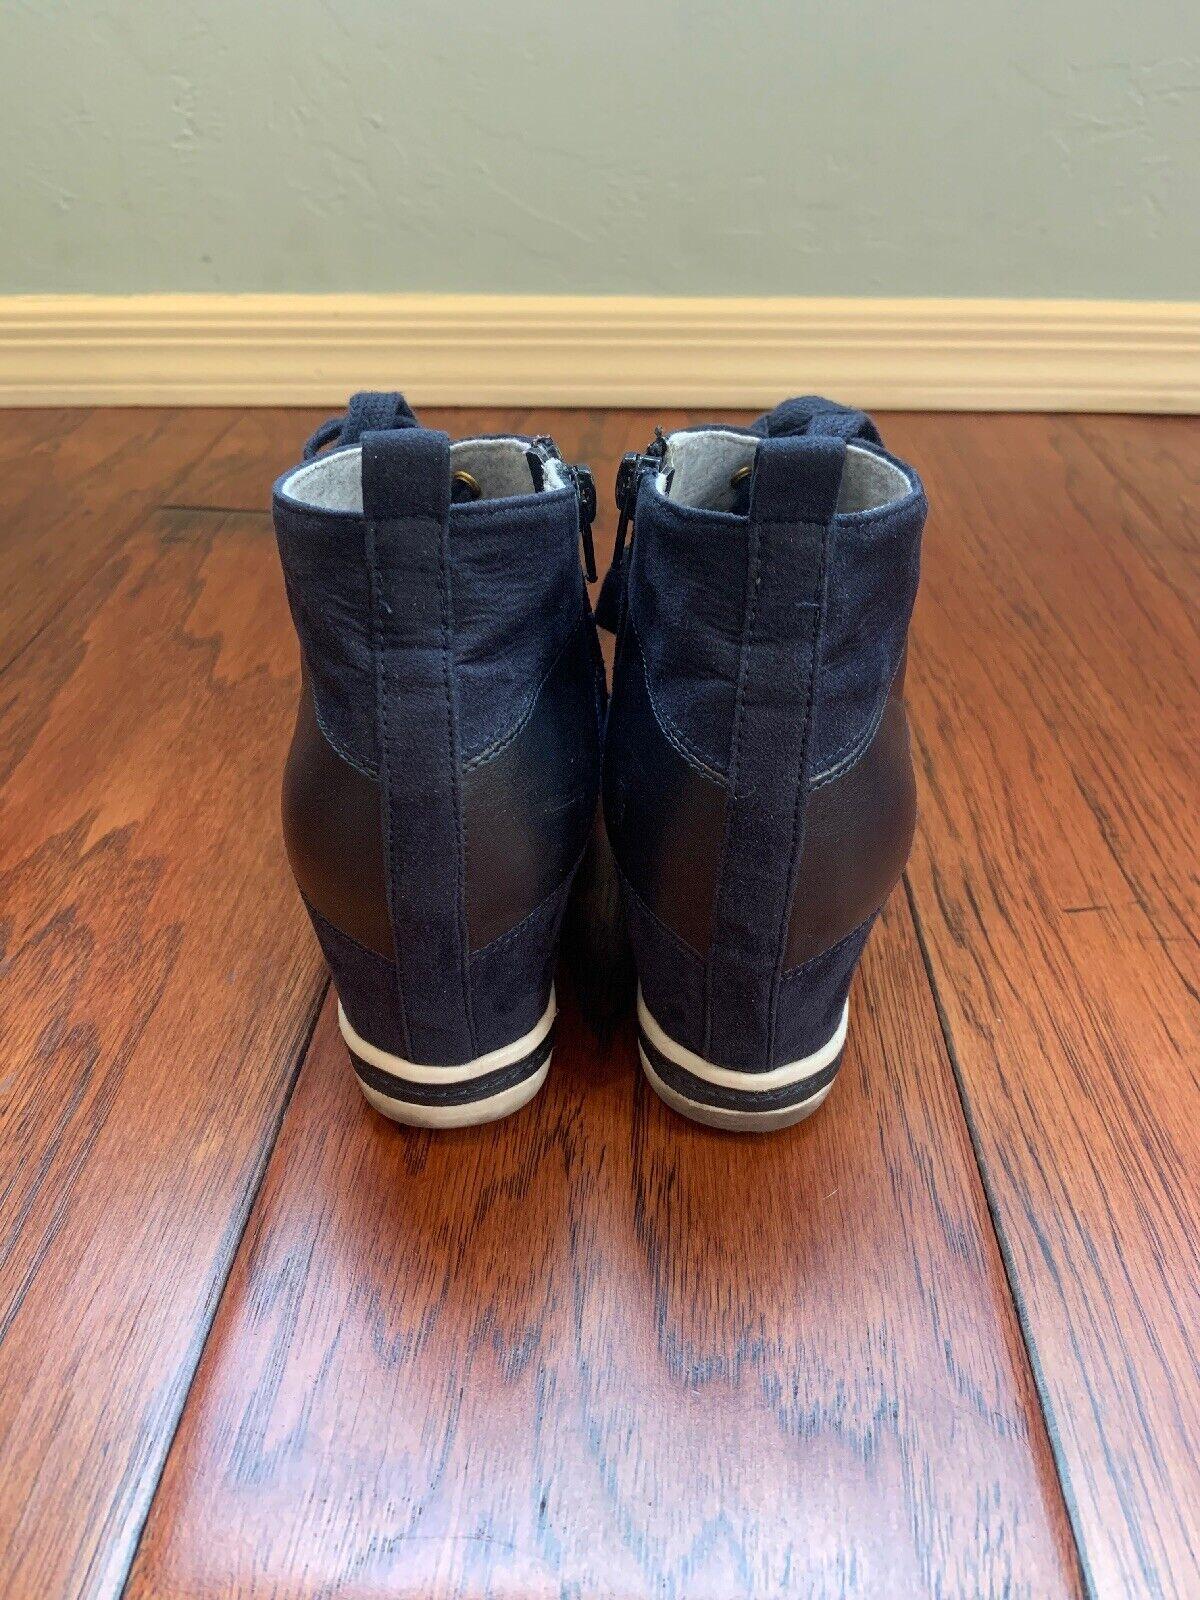 Tommy Hilfiger Boot Wedges - image 3